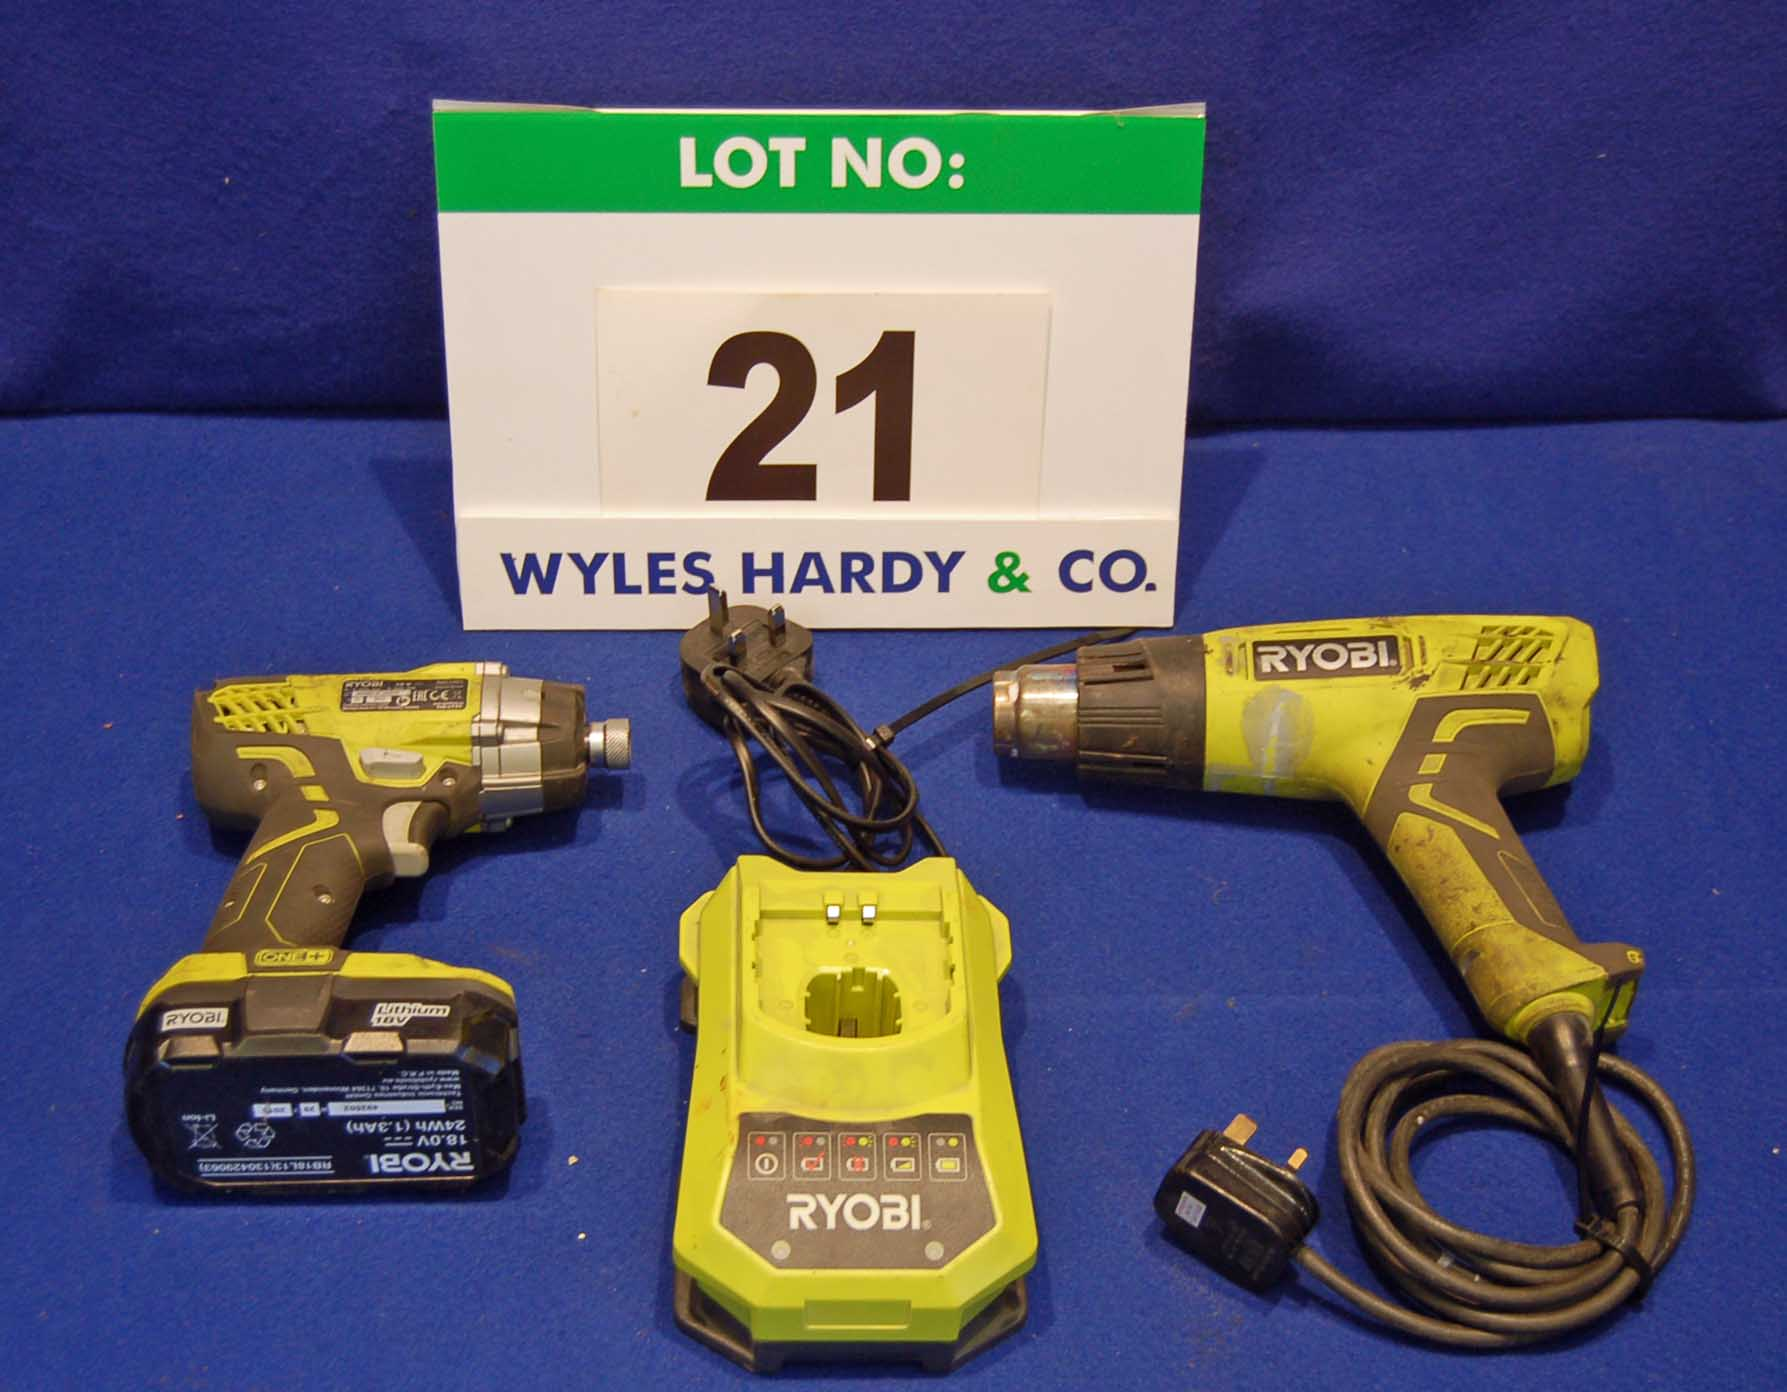 Lot 21 - A RYOBI ONE Plus RID1801M 18V Cordless Impact Driver and A RYOBI Hot Air Gun (240V)